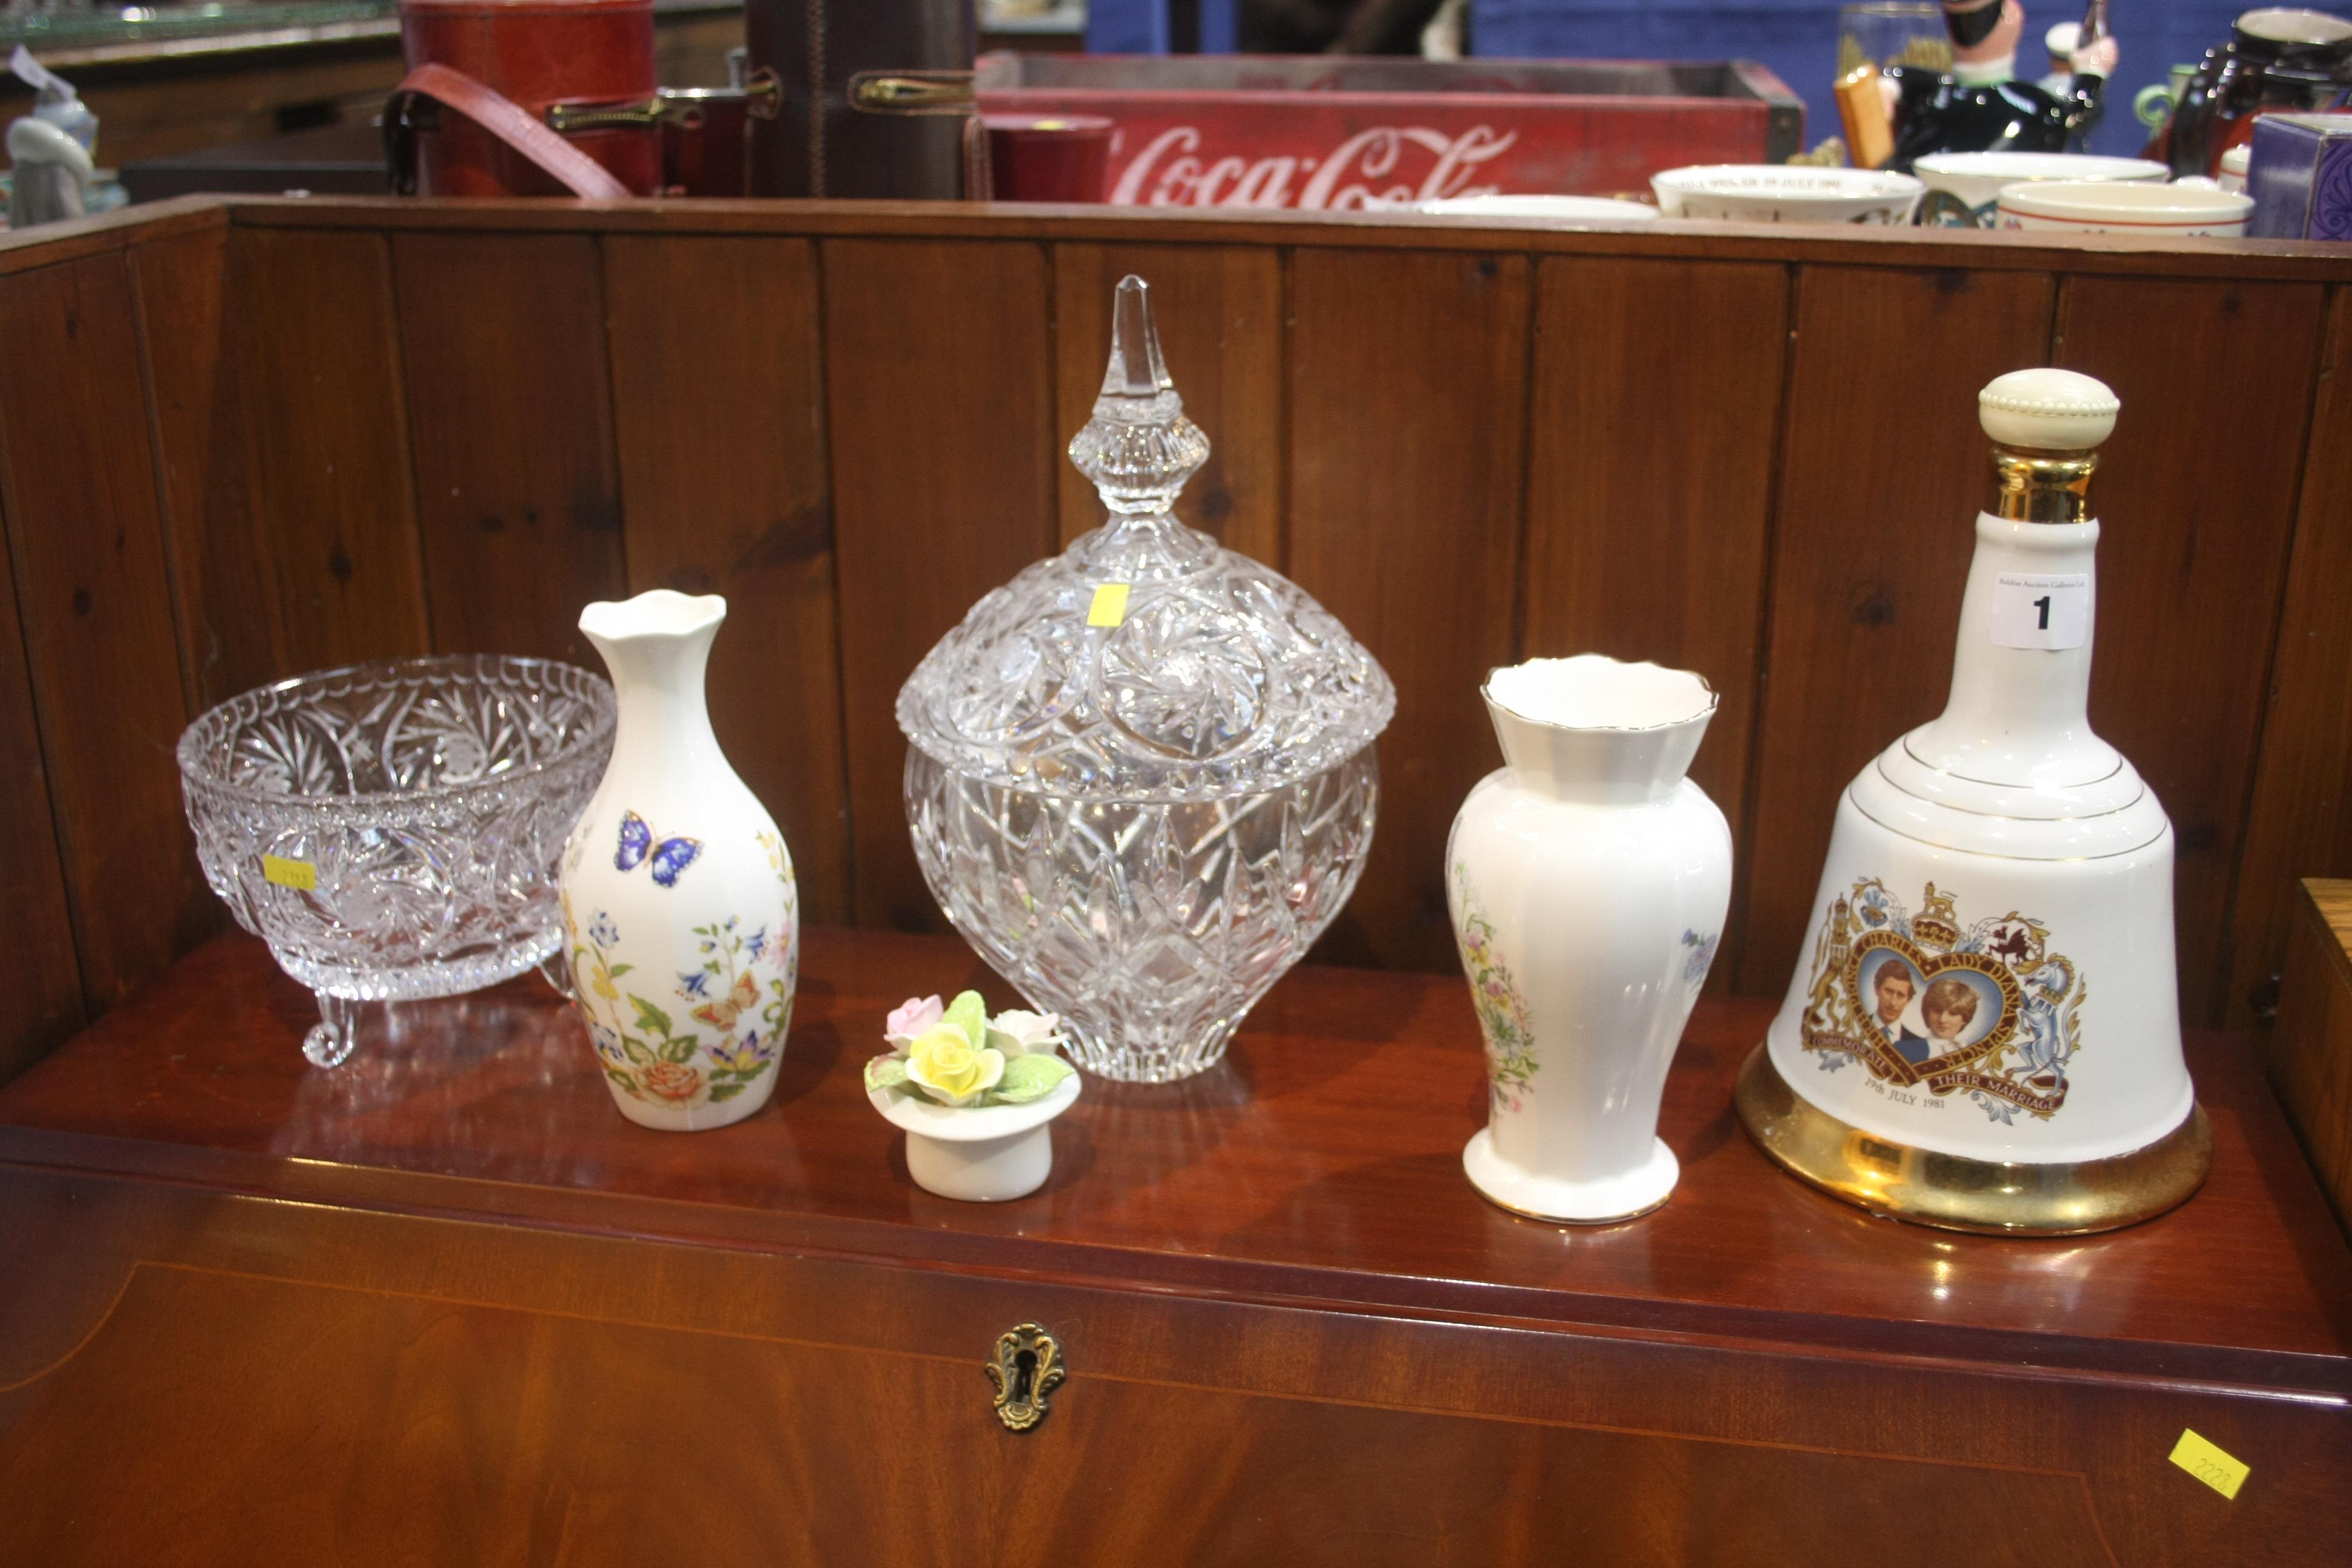 Lot 1 - Aynsley vases, Wade decanter